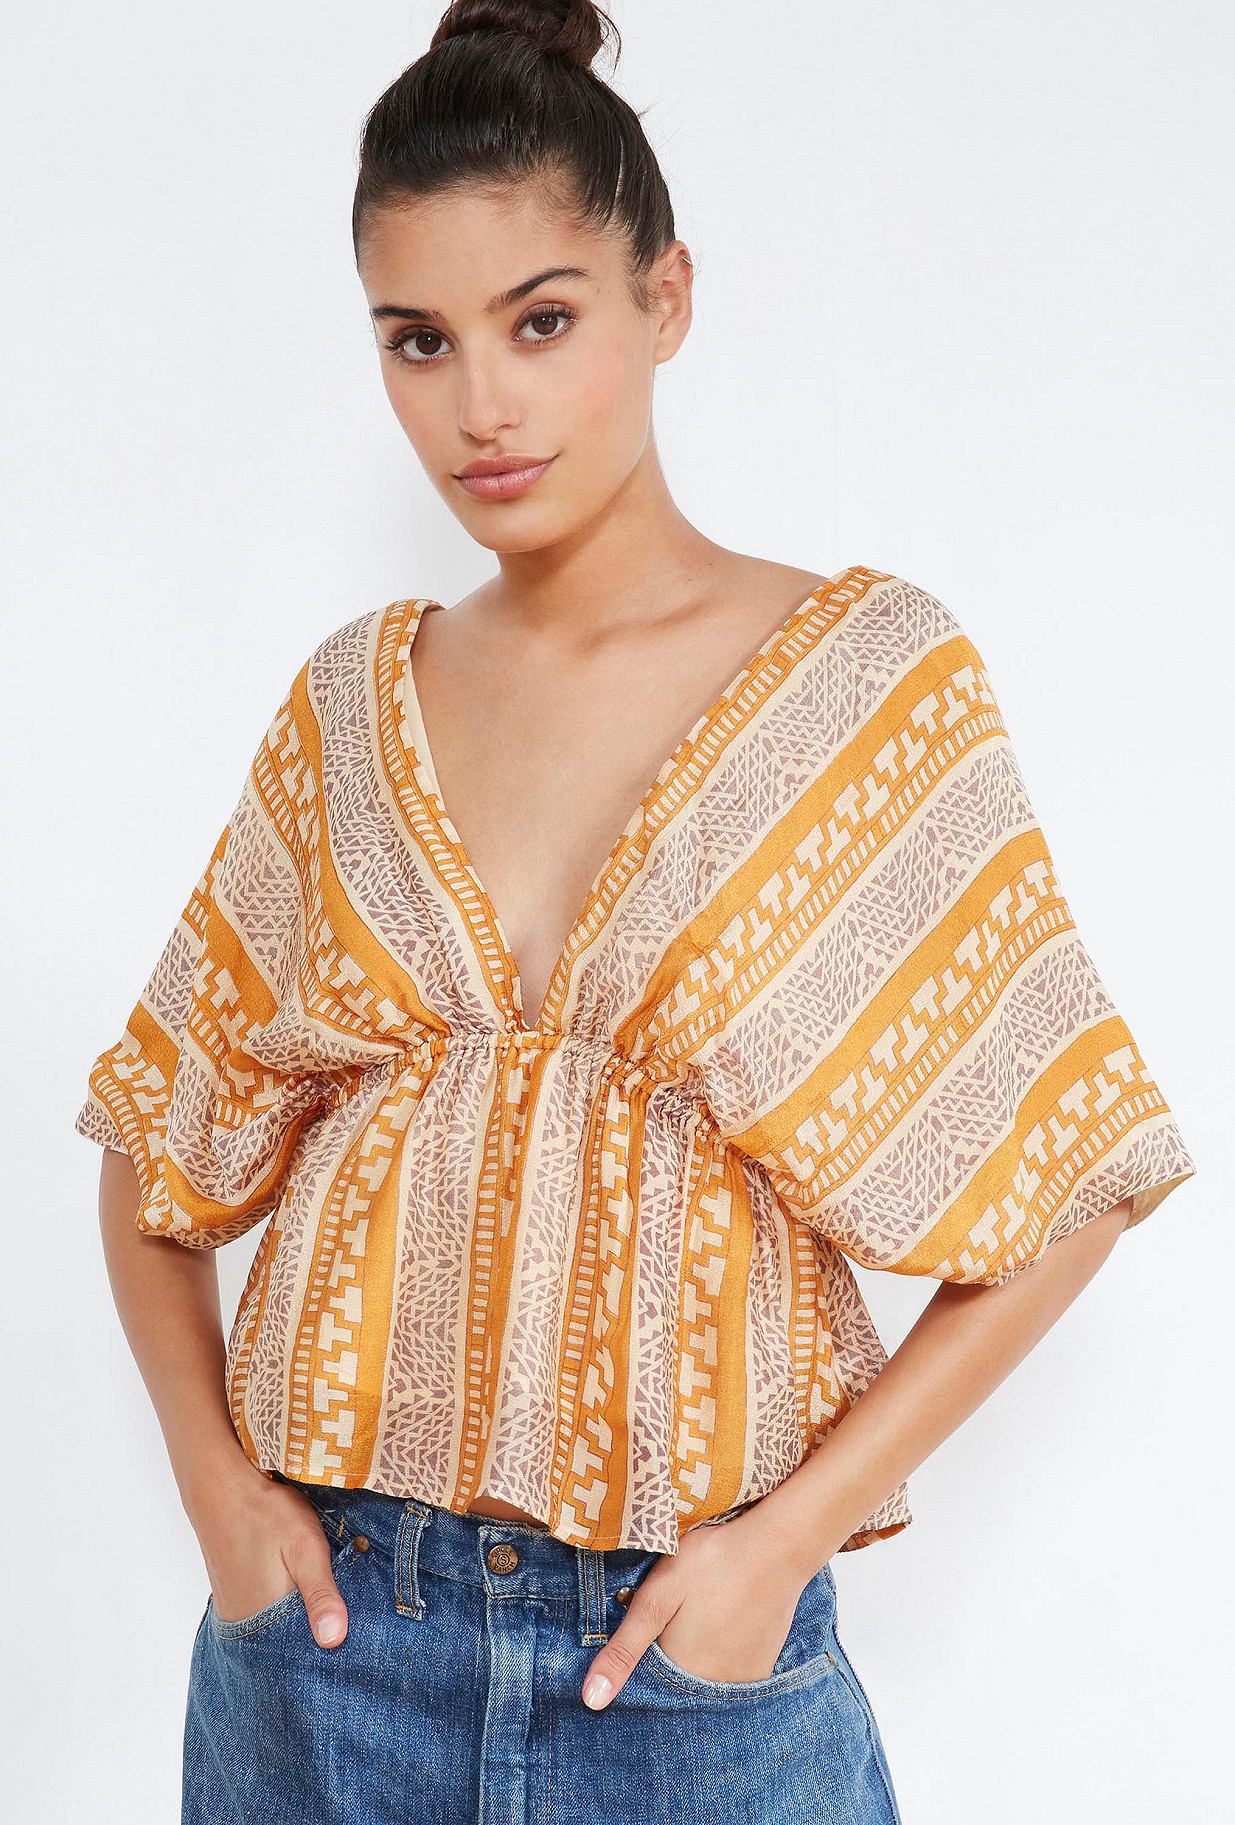 clothes store TOP  Sultane french designer fashion Paris